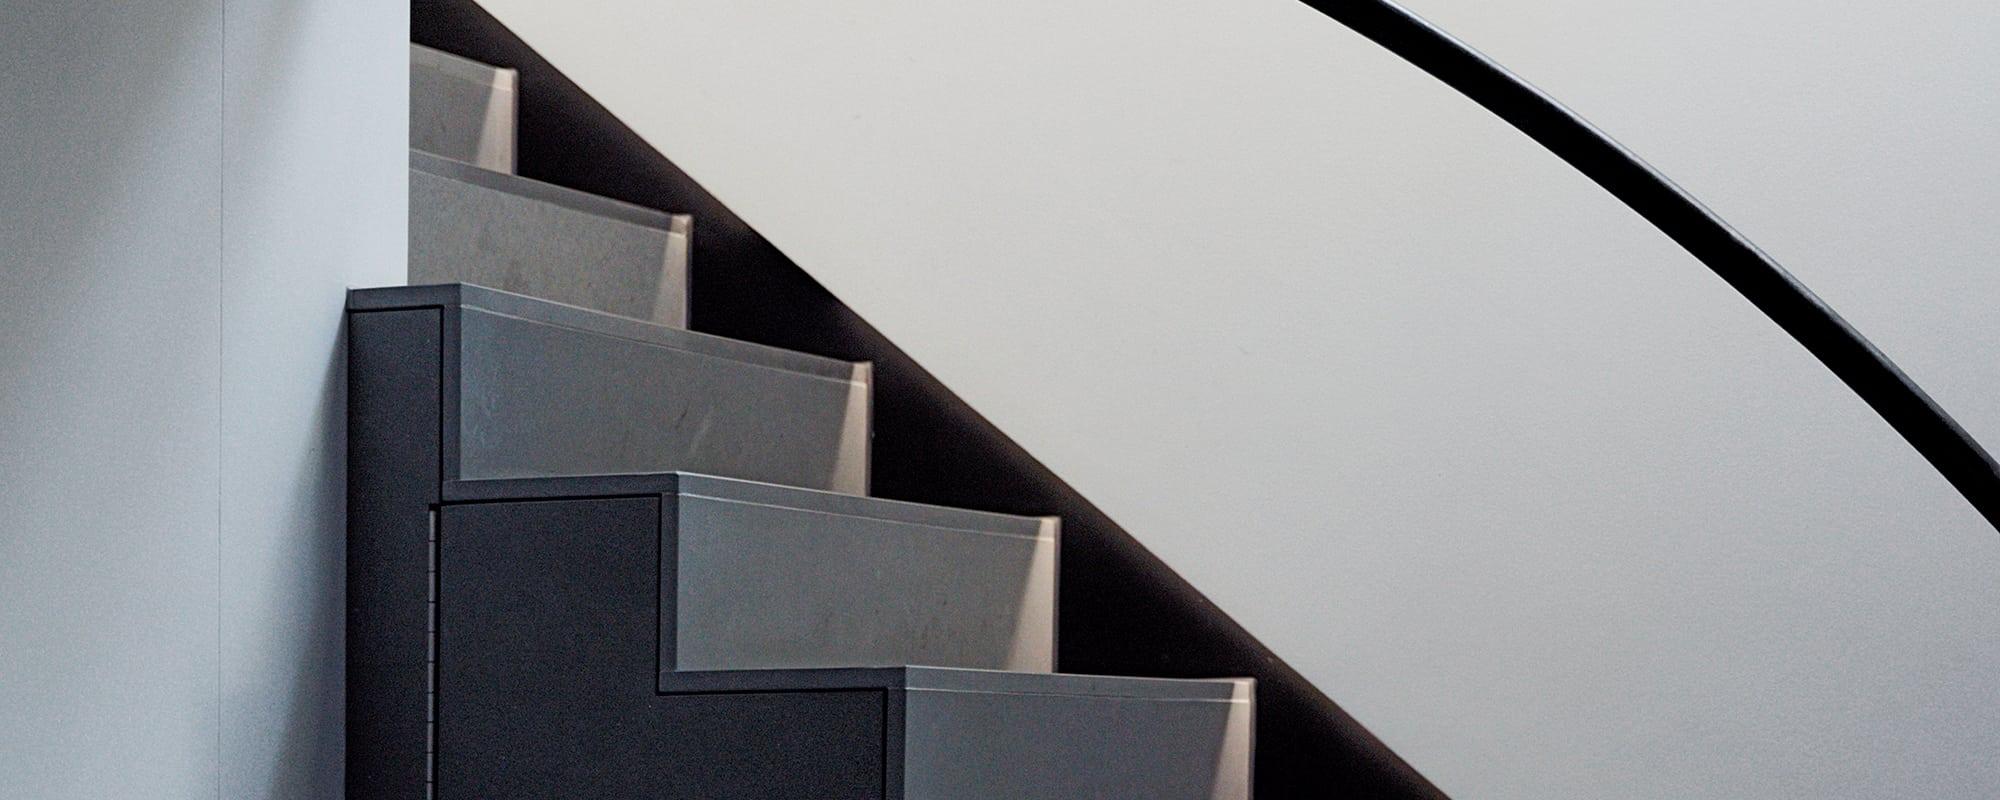 Treppe, Boden, Sandstein, Mansarde, Balkon